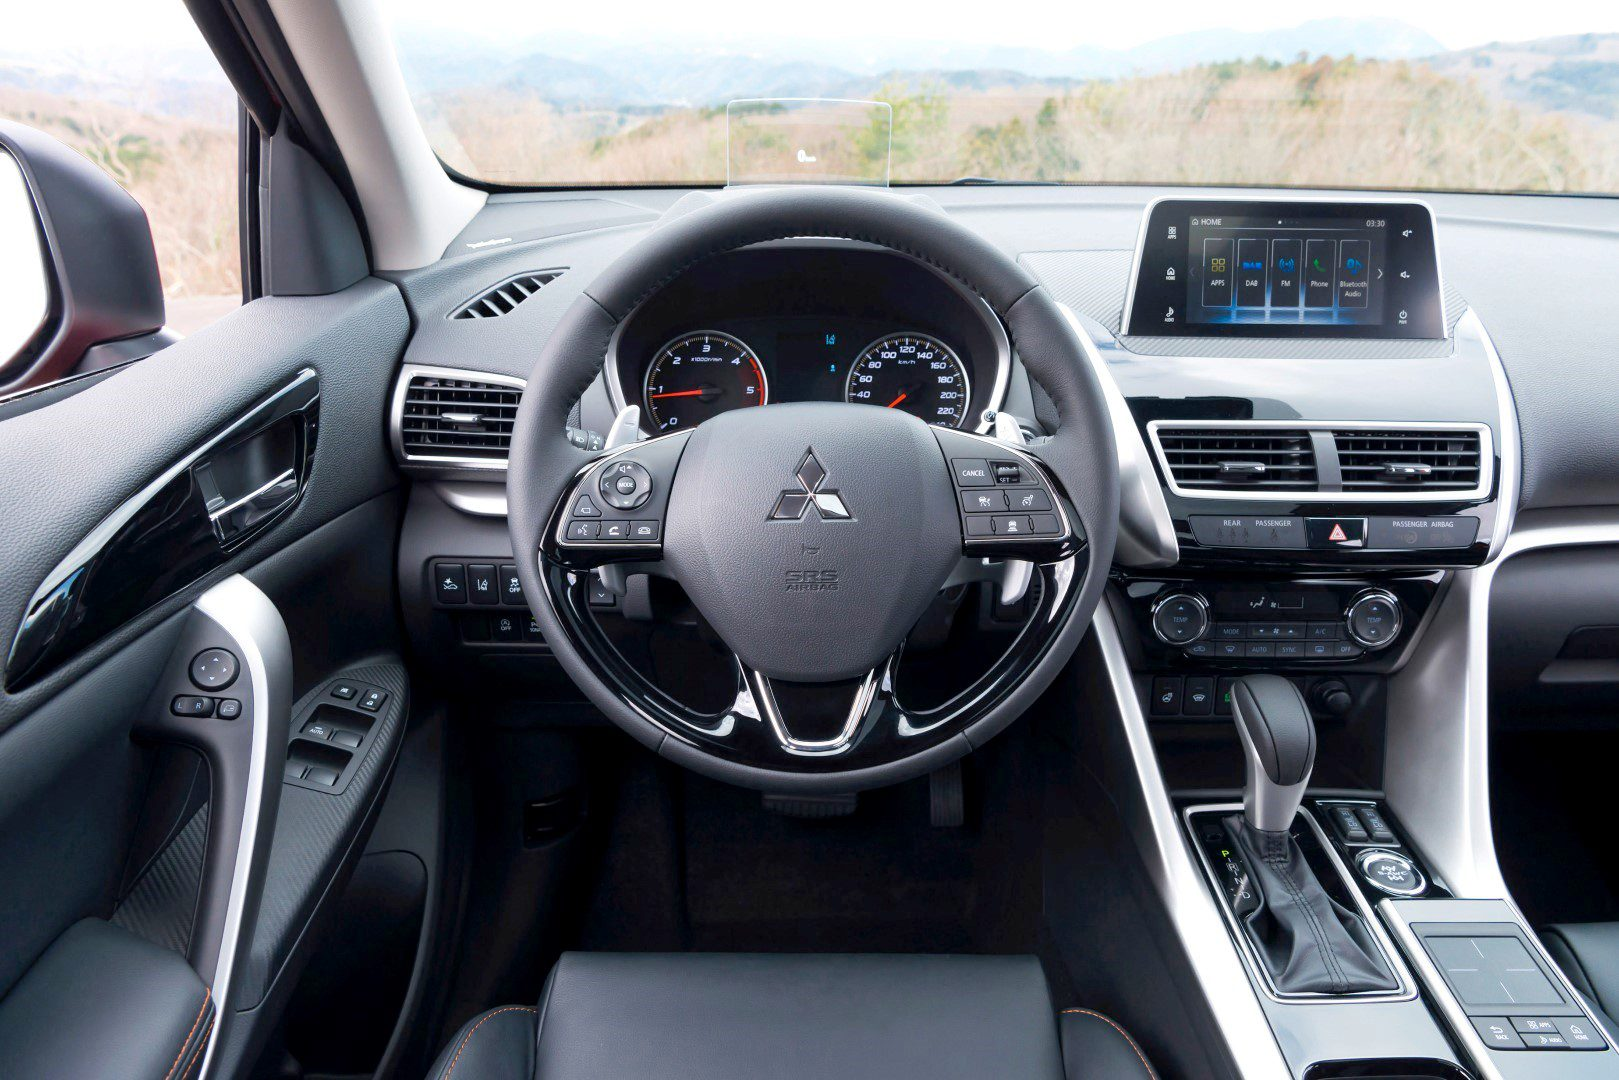 Prijzen Mitsubishi Eclipse Cross Bekend Dagelijksauto Nl